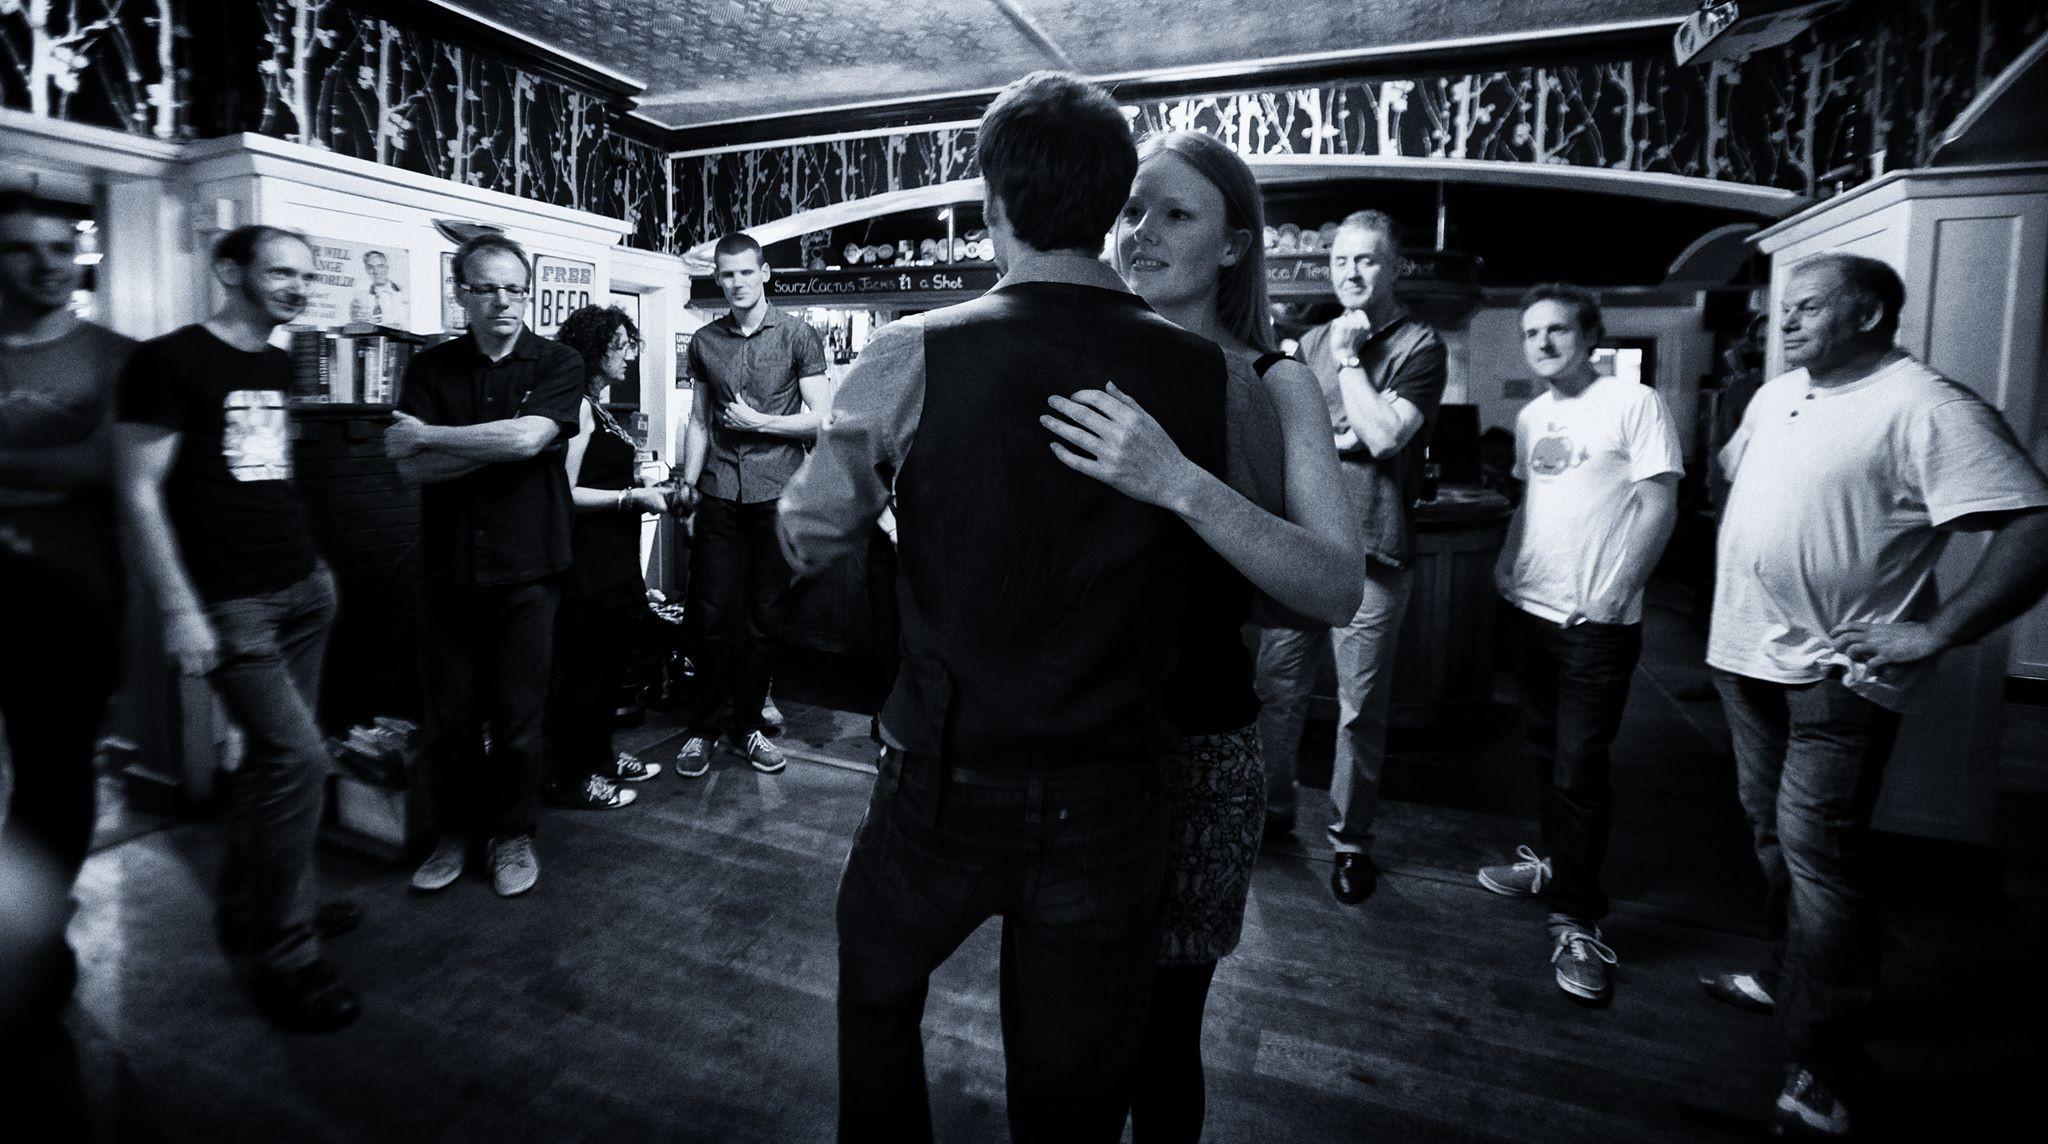 MON Blues class with social dance